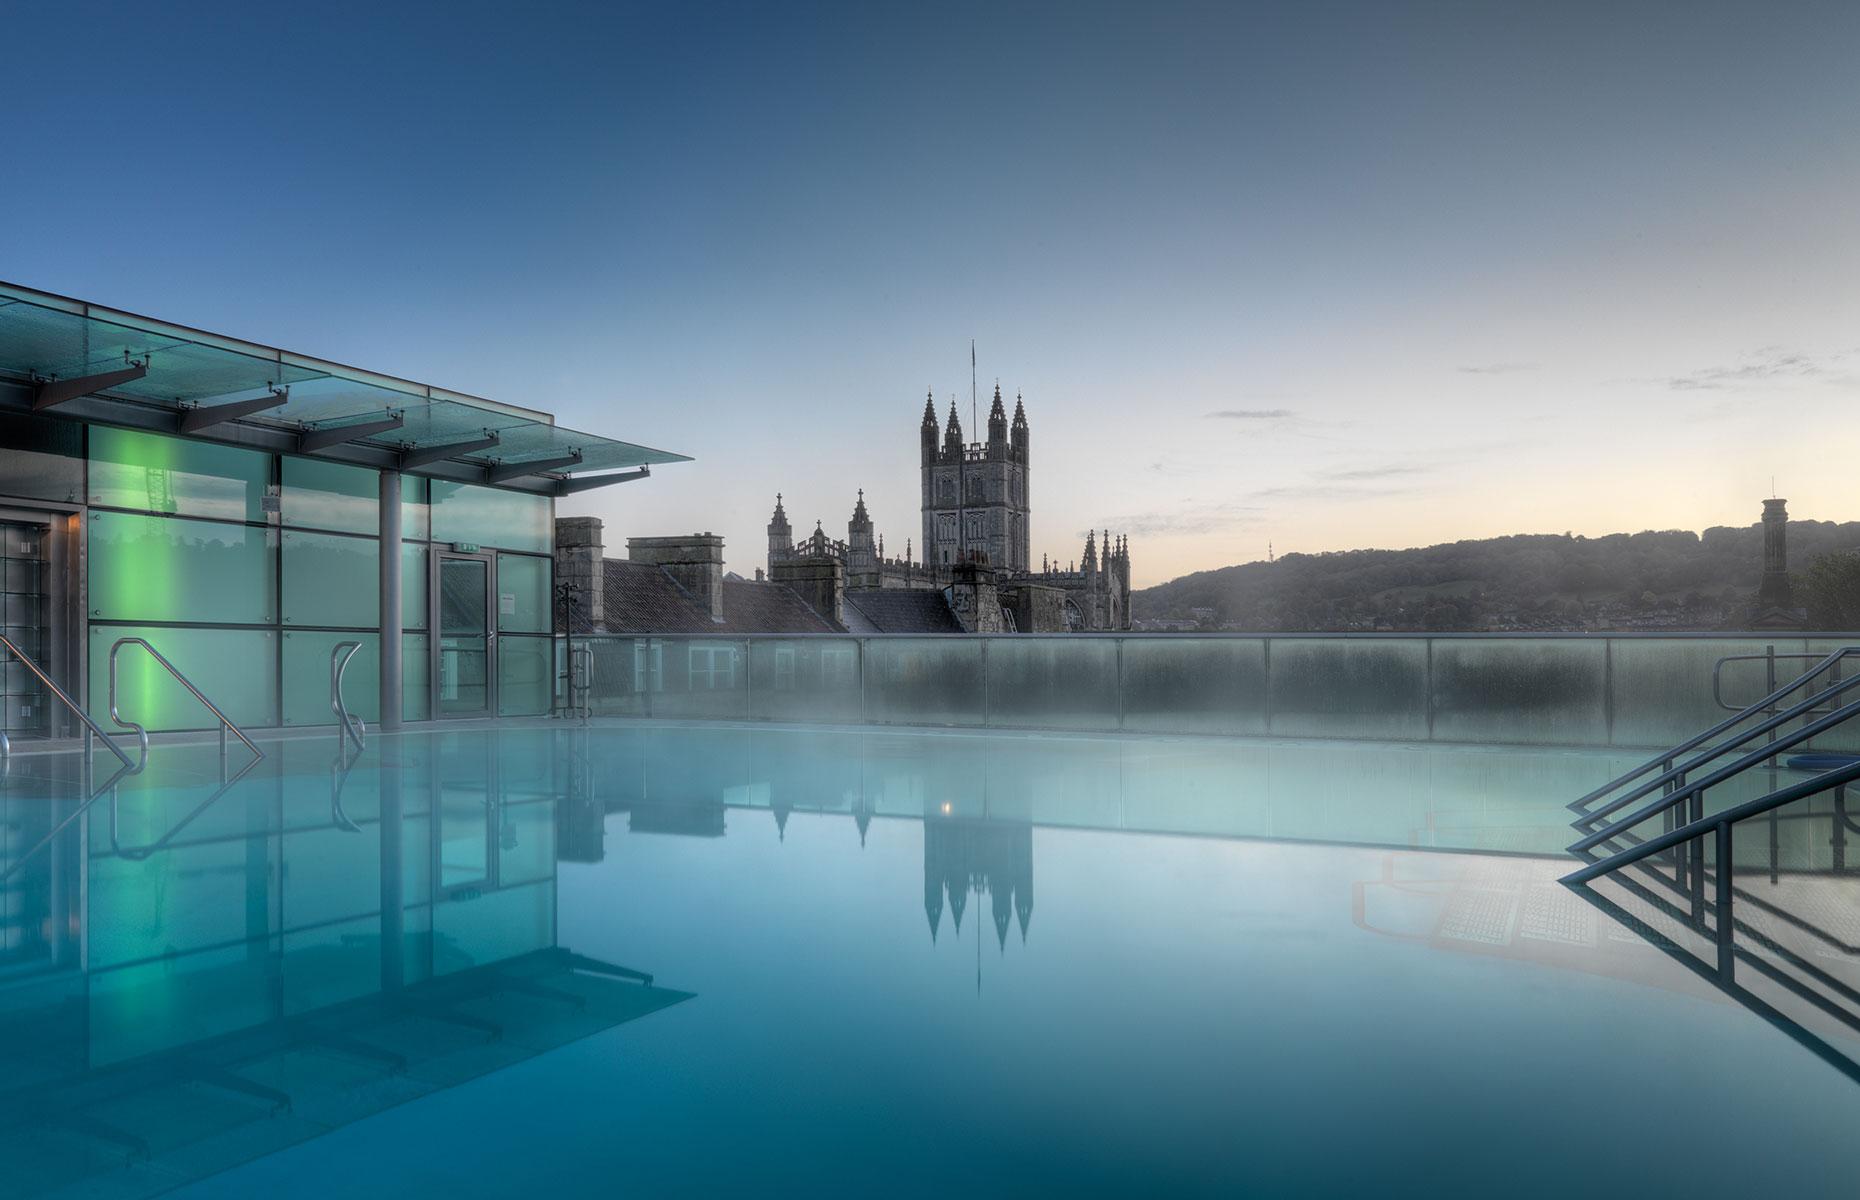 Thermae Bath Spa's rooftop pool, Bath